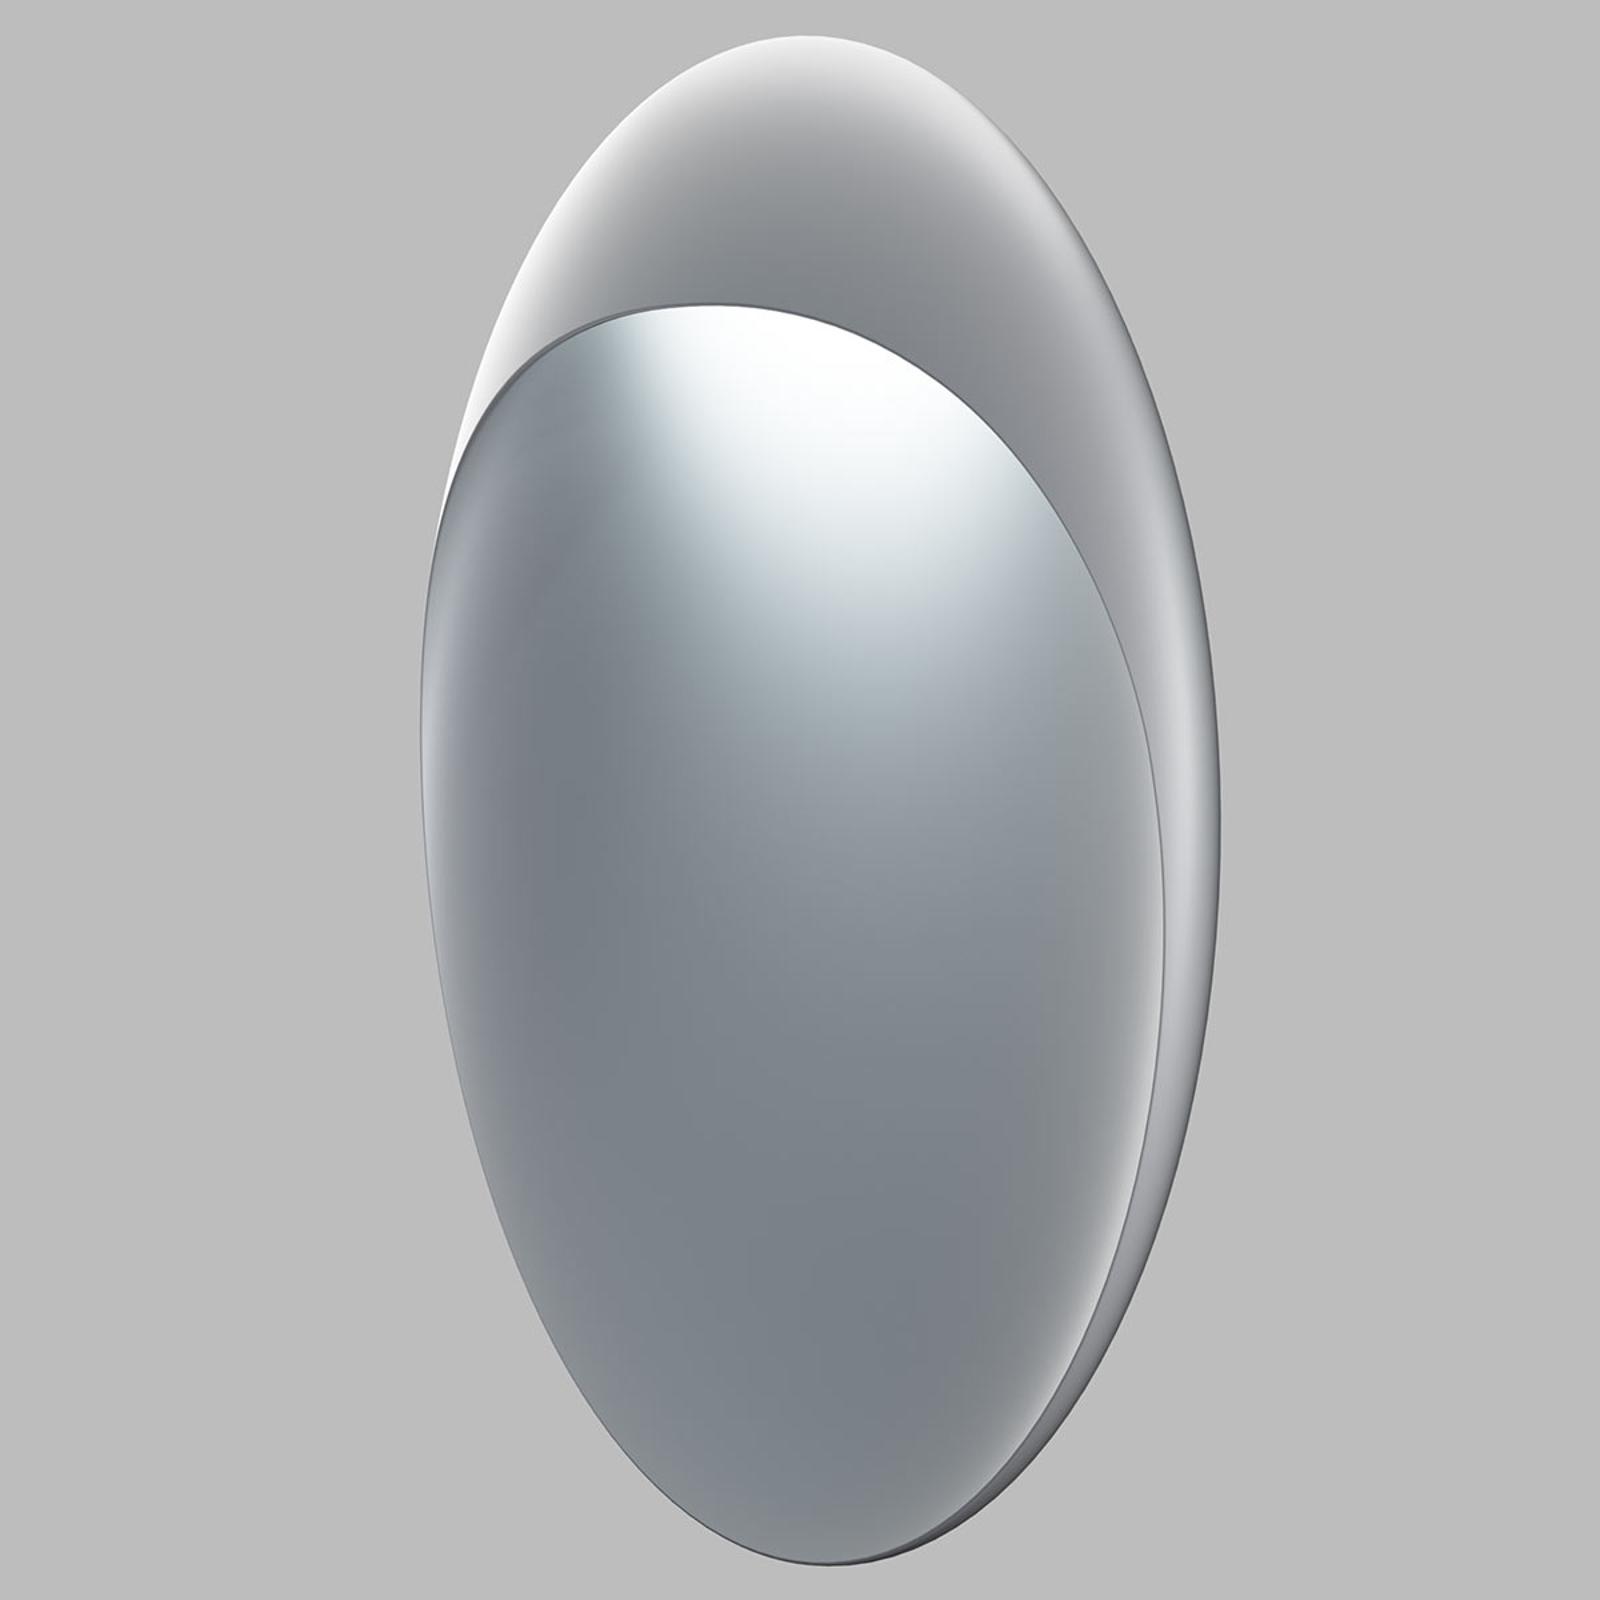 Louis Poulsen Flindt Ø 40 cm alumiini 2700K